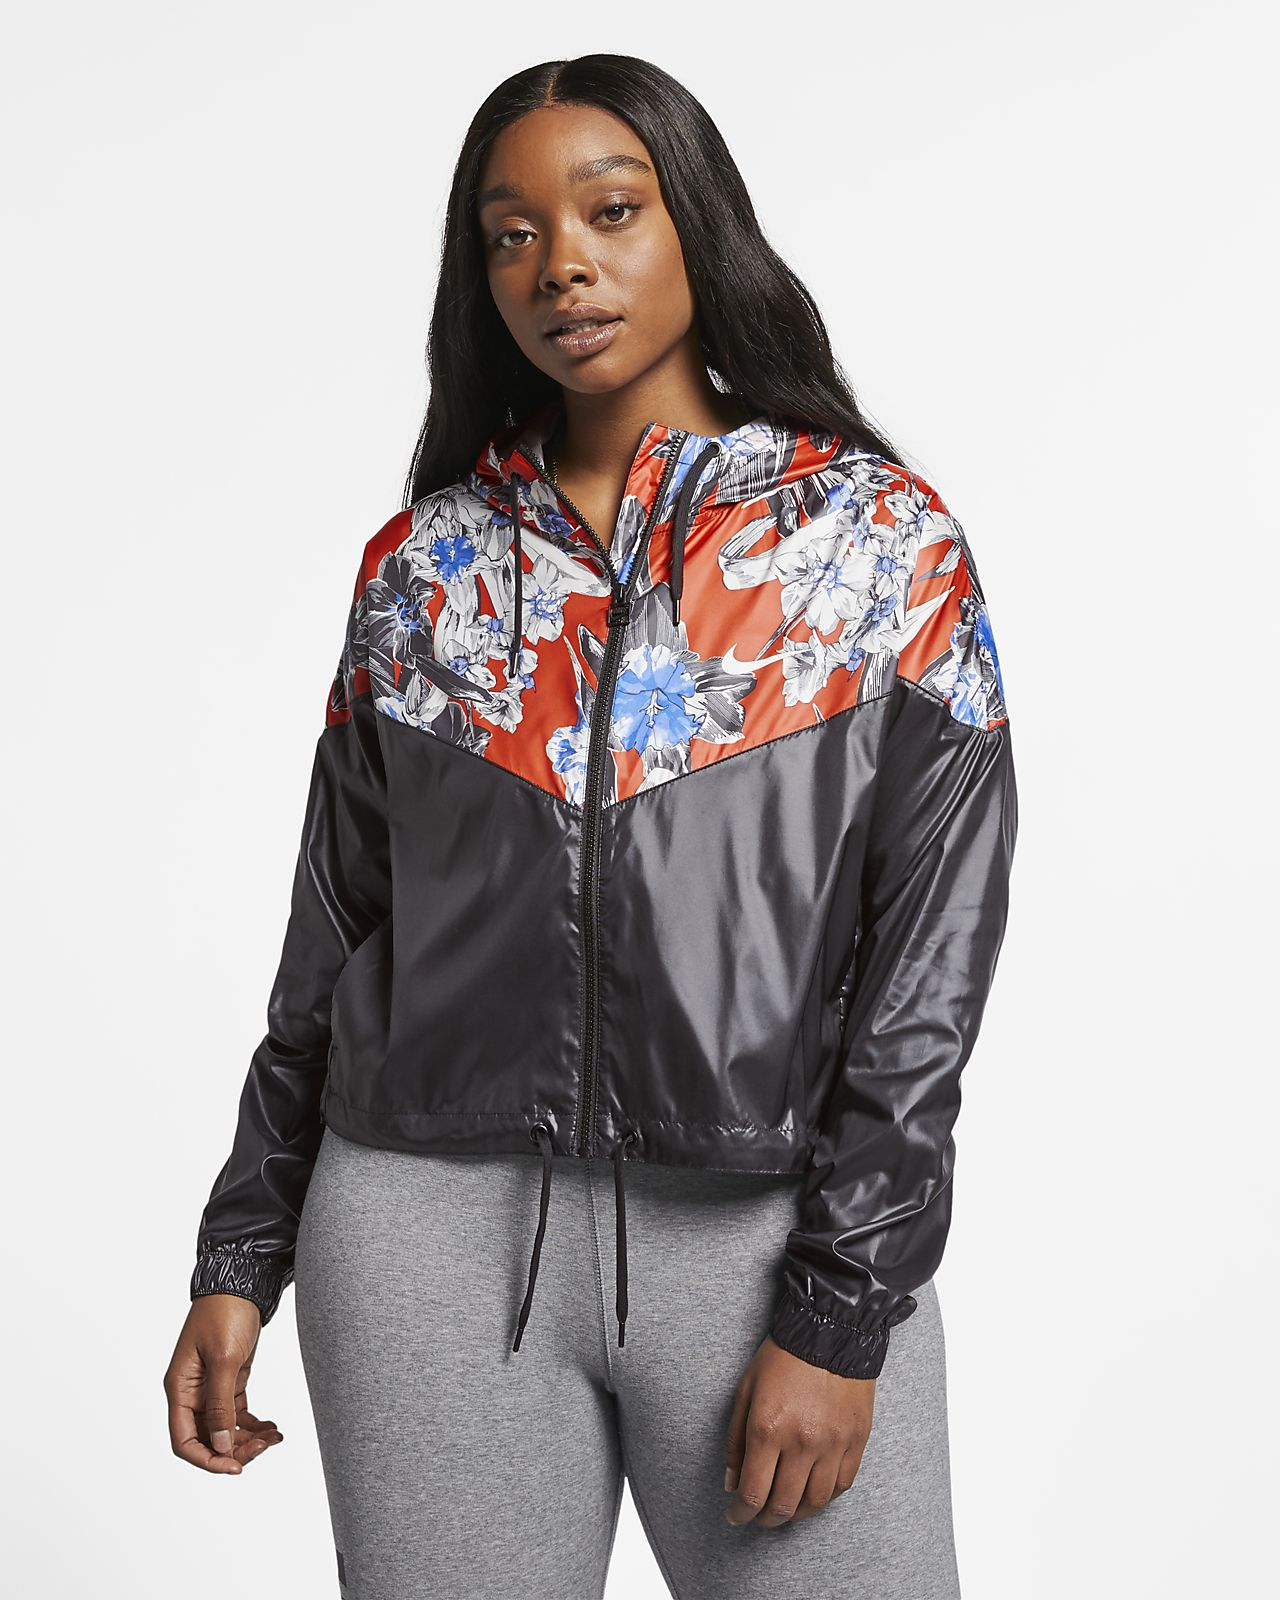 Pour grande Courte Sportswear Nike Taille Femme Veste Windrunner UYRaa